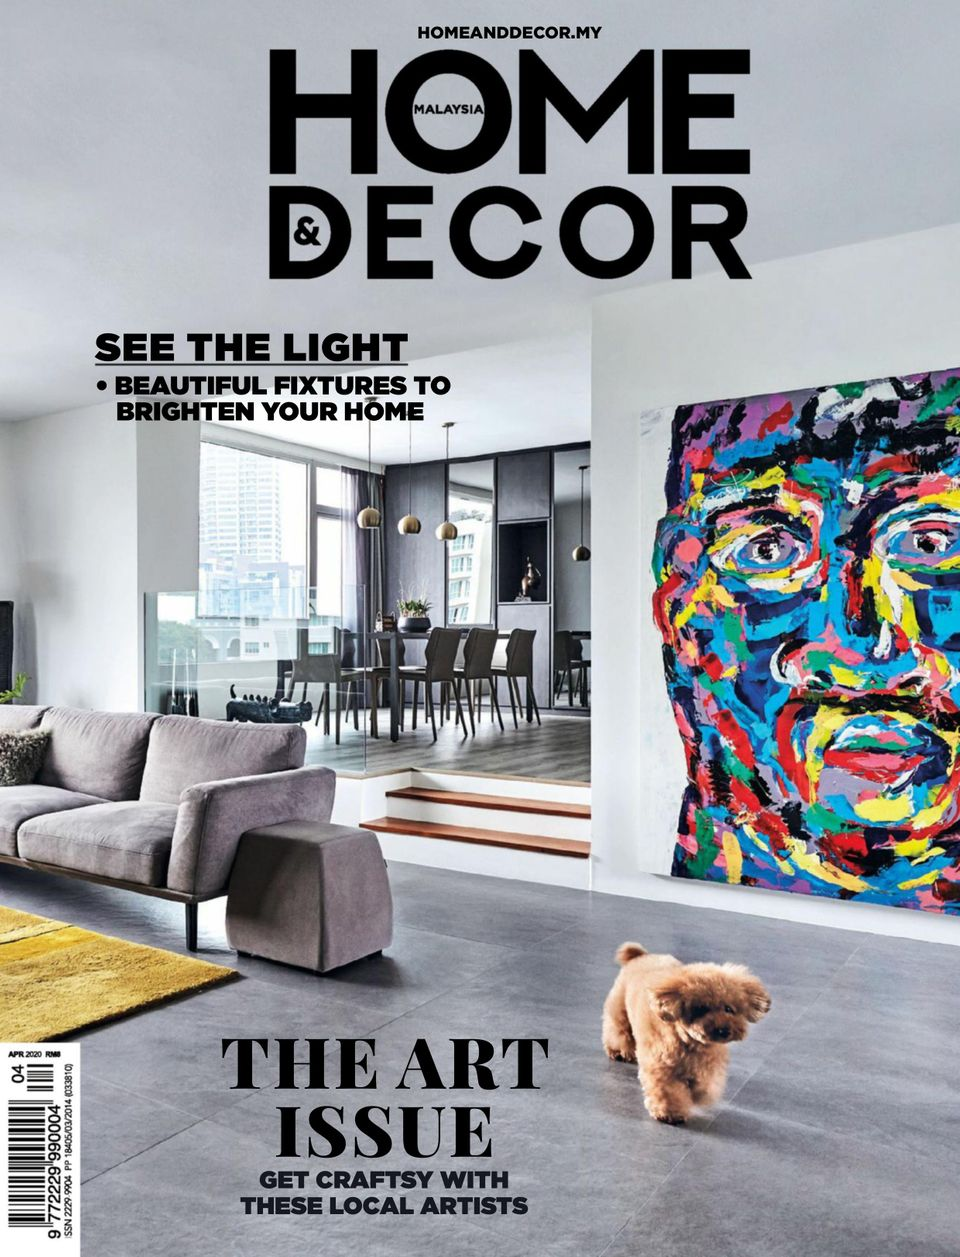 Home & Decor Malaysia Magazine   Get your Digital Subscription